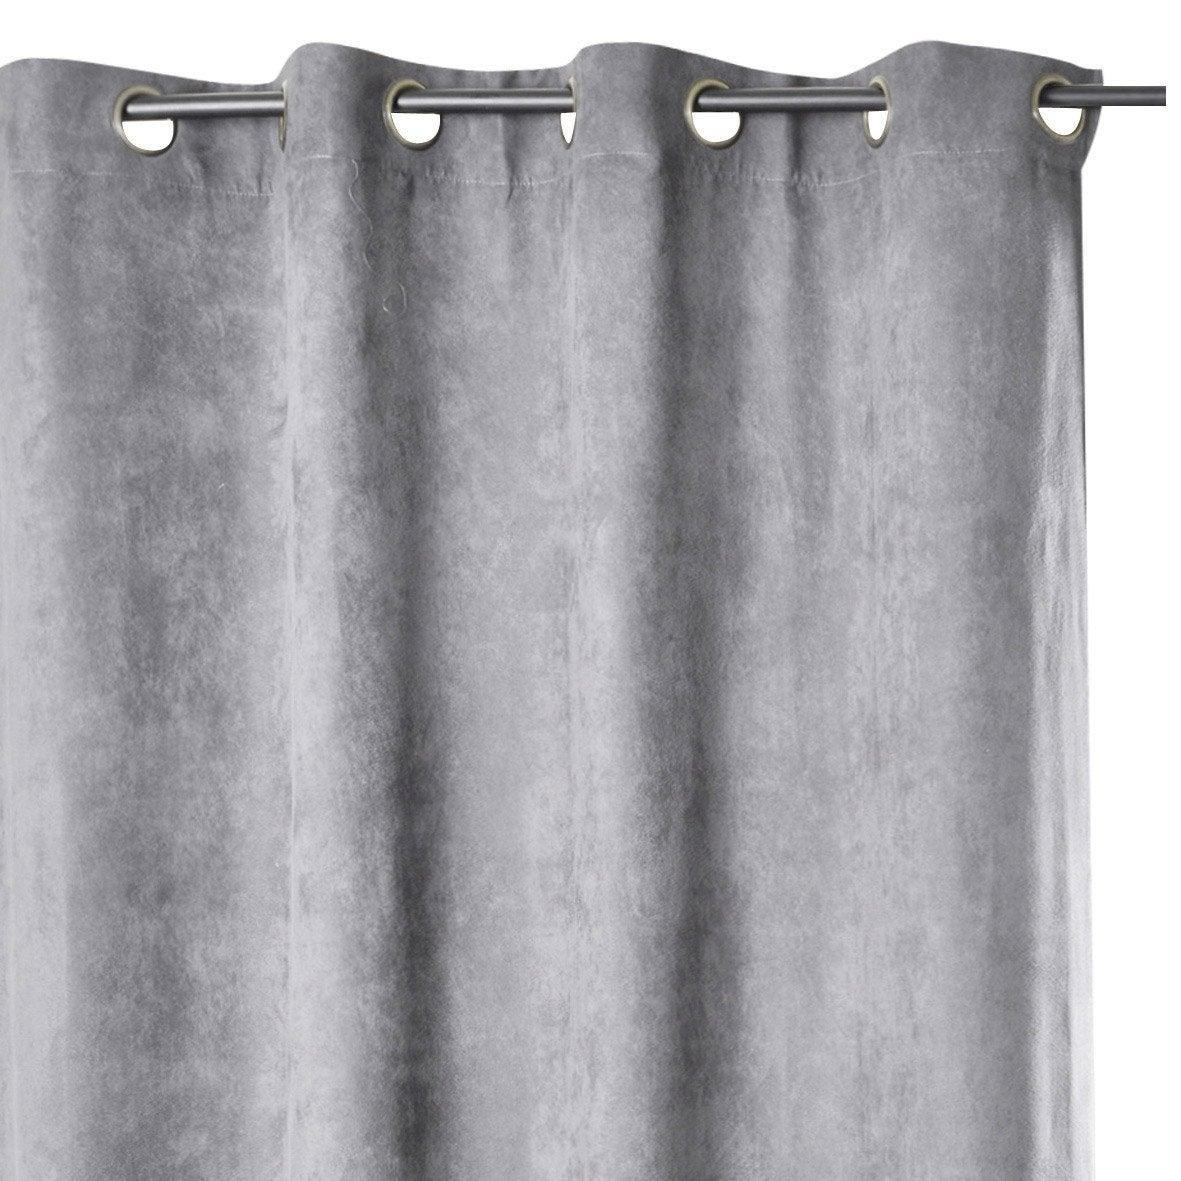 rideau suedine occultante gris x cm leroy merlin. Black Bedroom Furniture Sets. Home Design Ideas